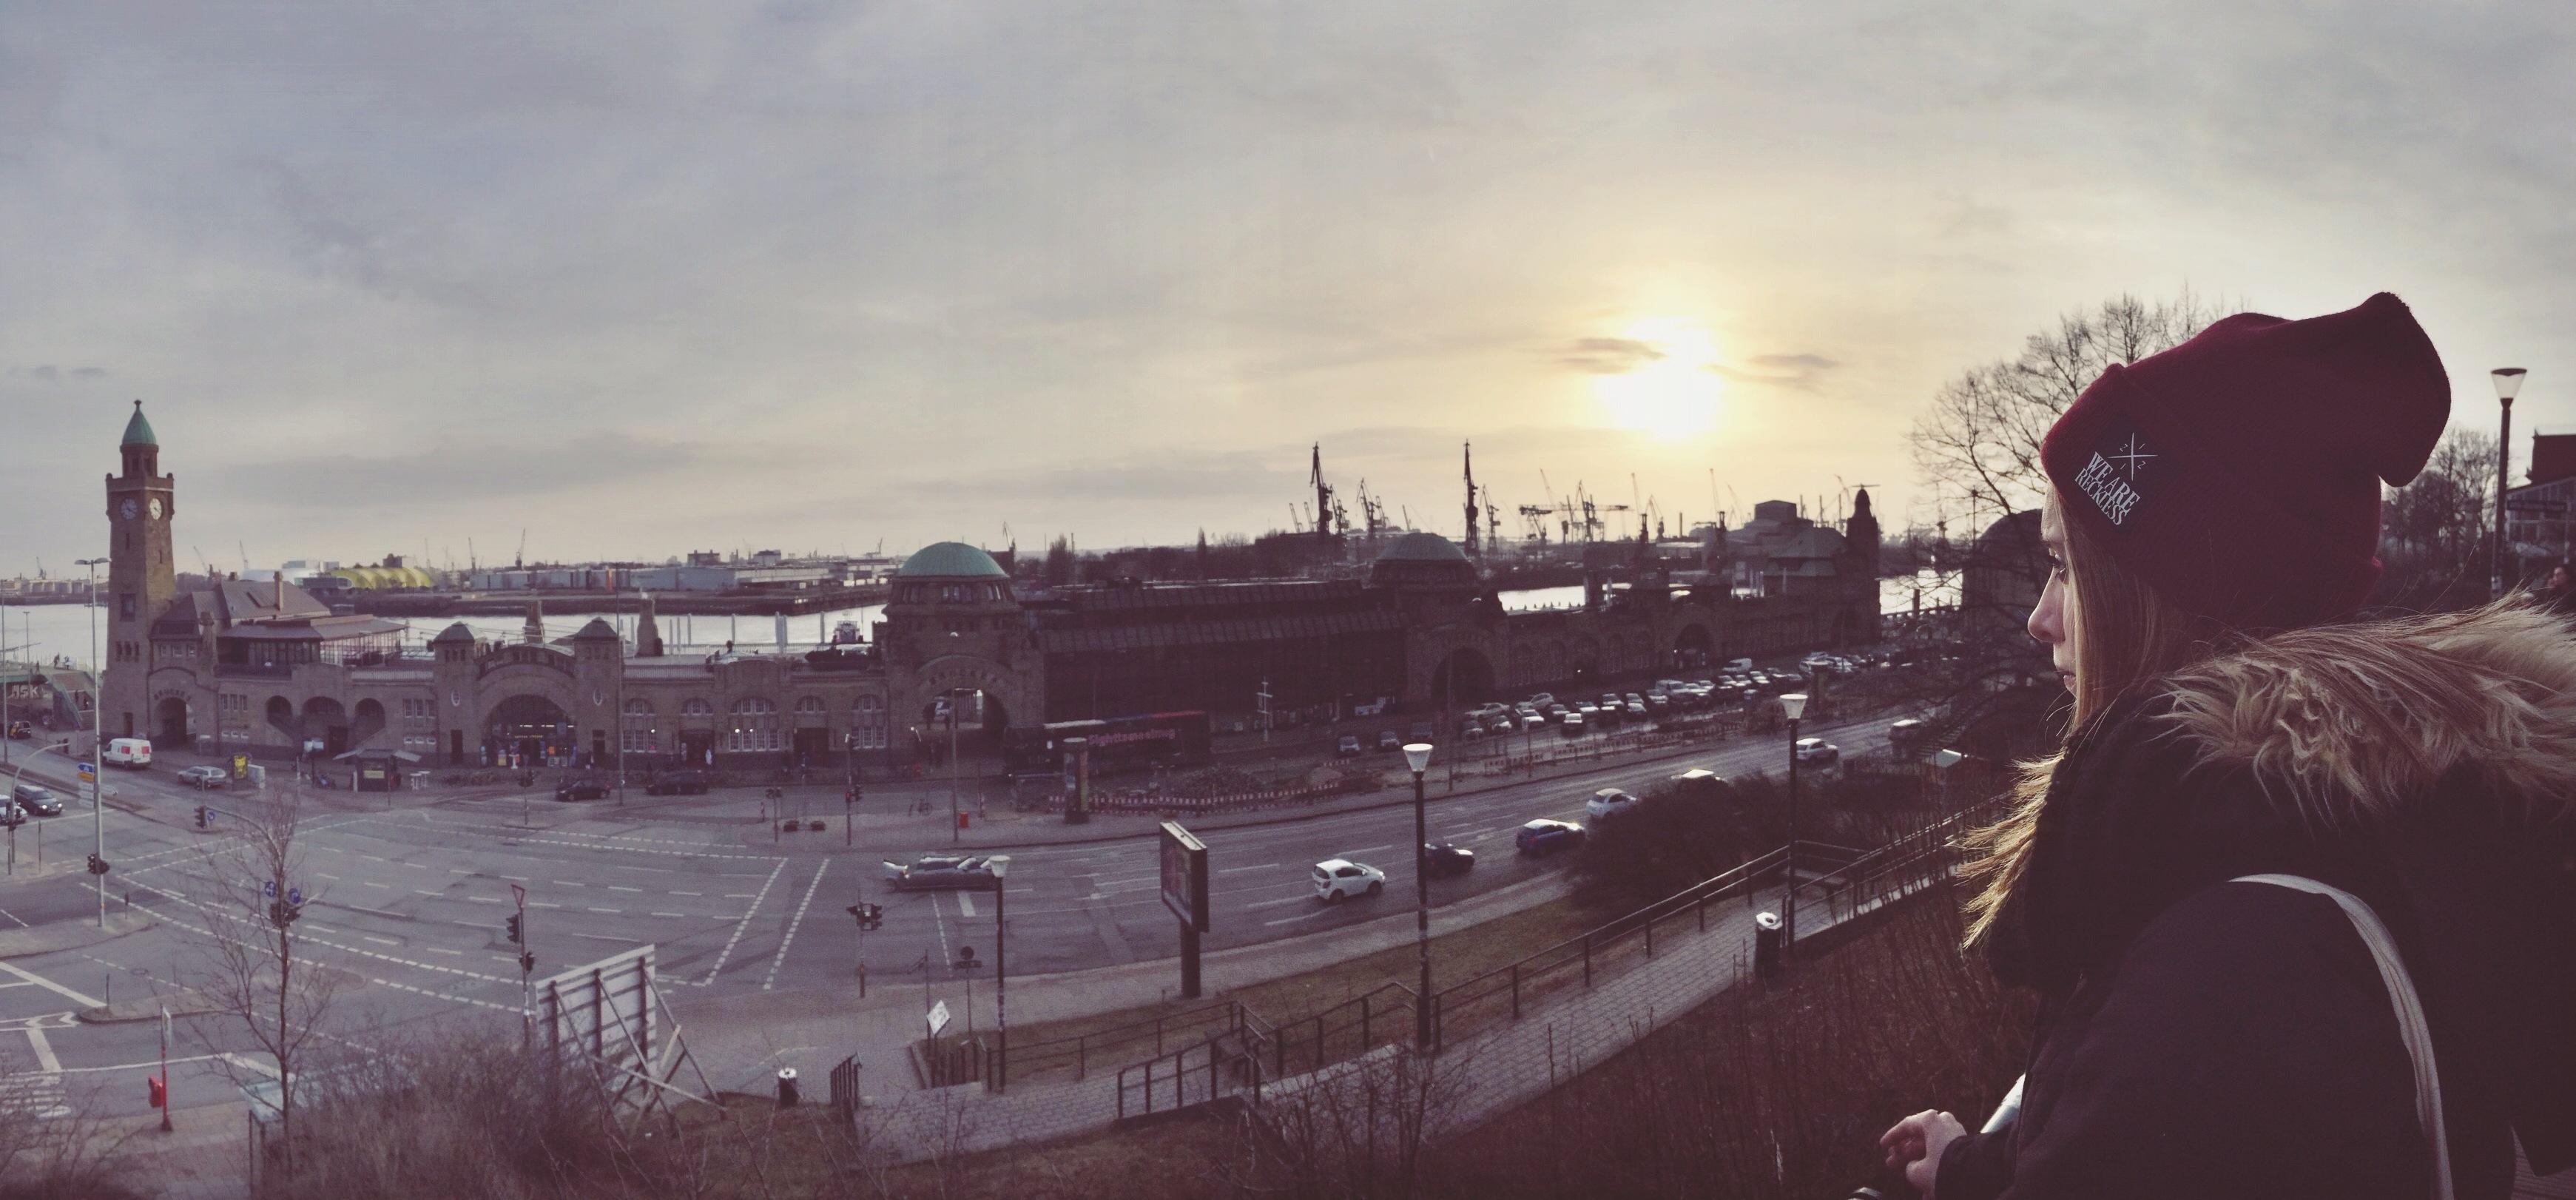 WE ARE RECKLESS - Hamburg